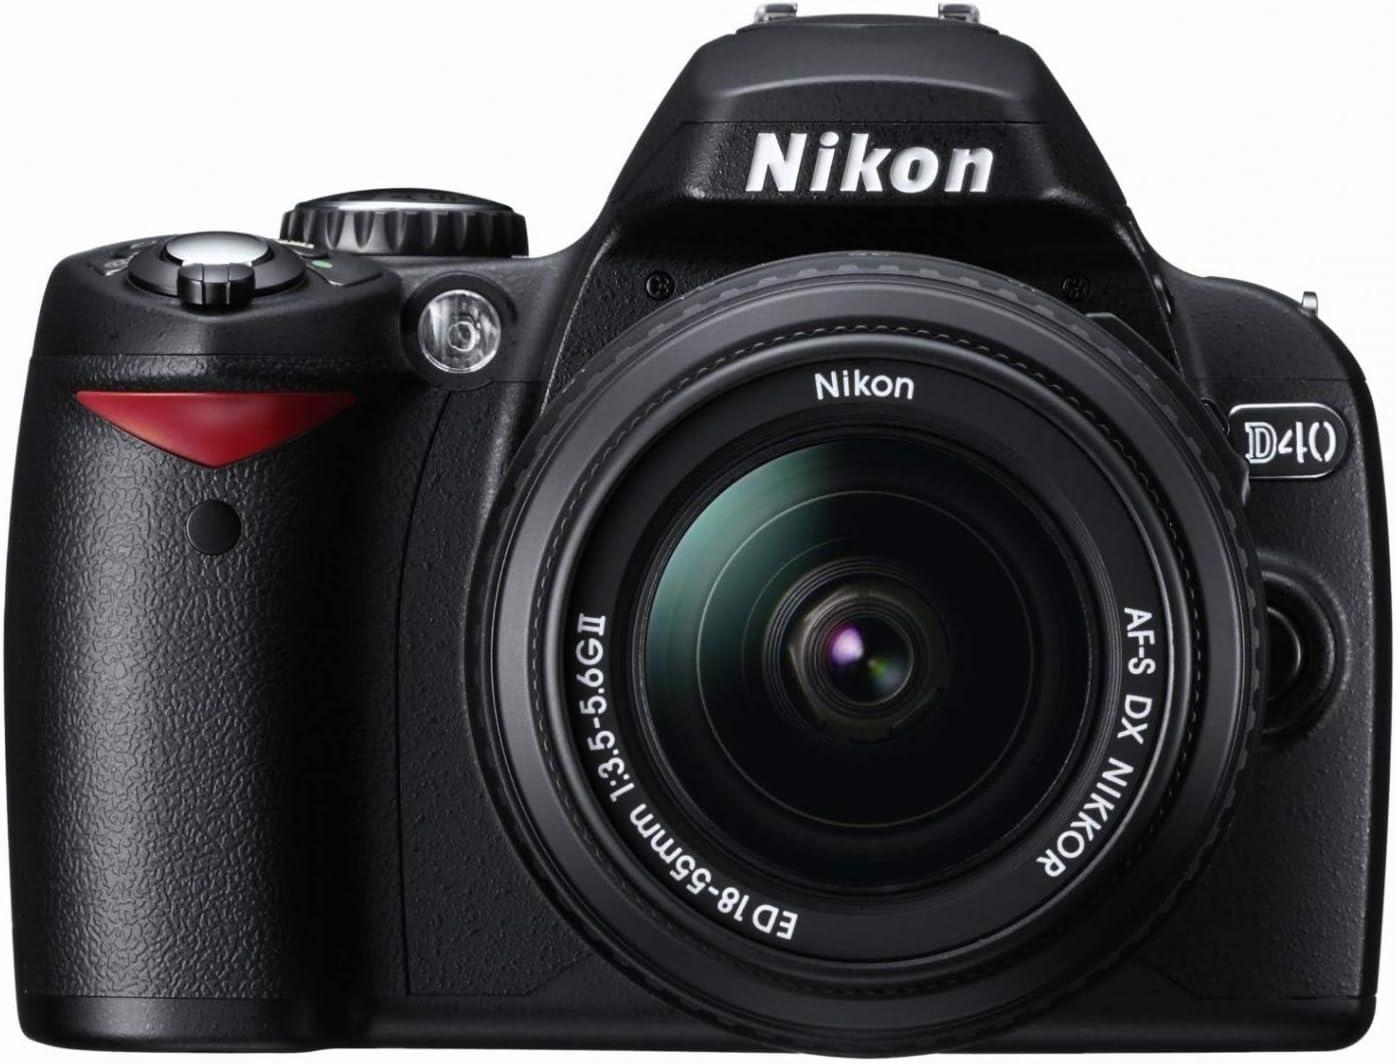 Nikon D40 - Cámara Réflex Digital 6.1 MP (Objetivo w/ 18-55mm ...